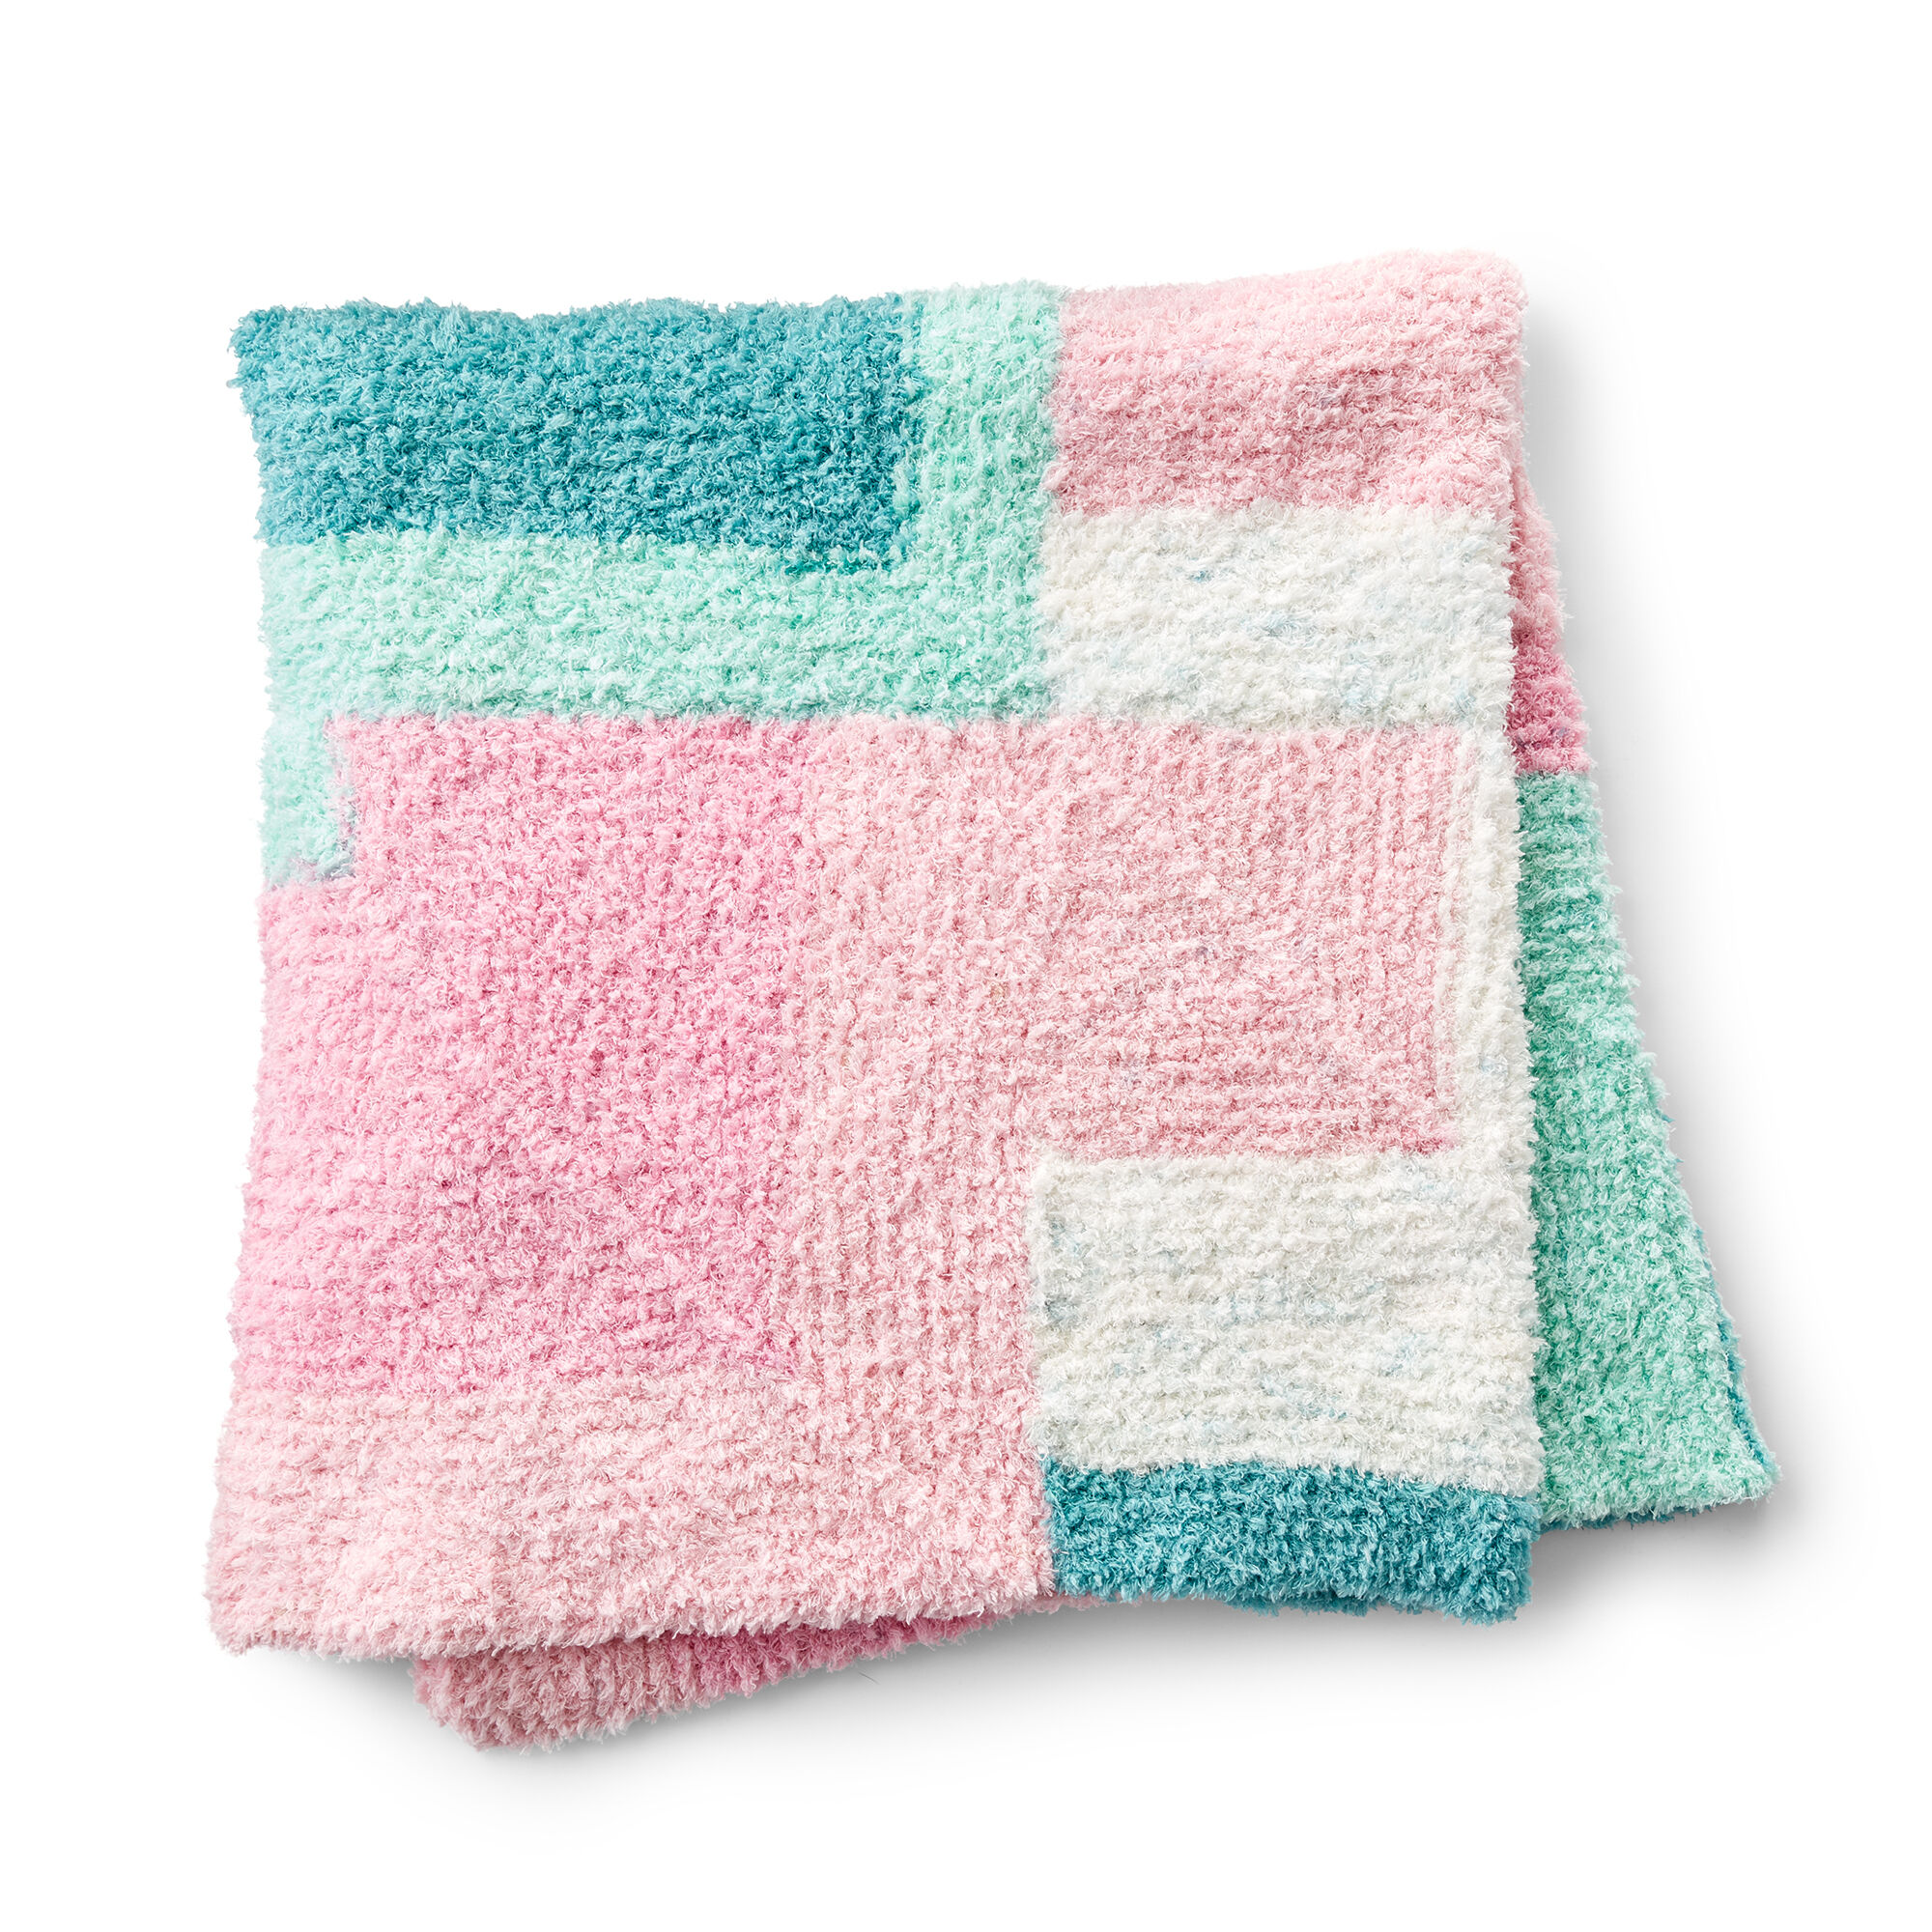 Bernat Cloud Nine Knit Baby Blanket Pattern | Yarnspirations ...